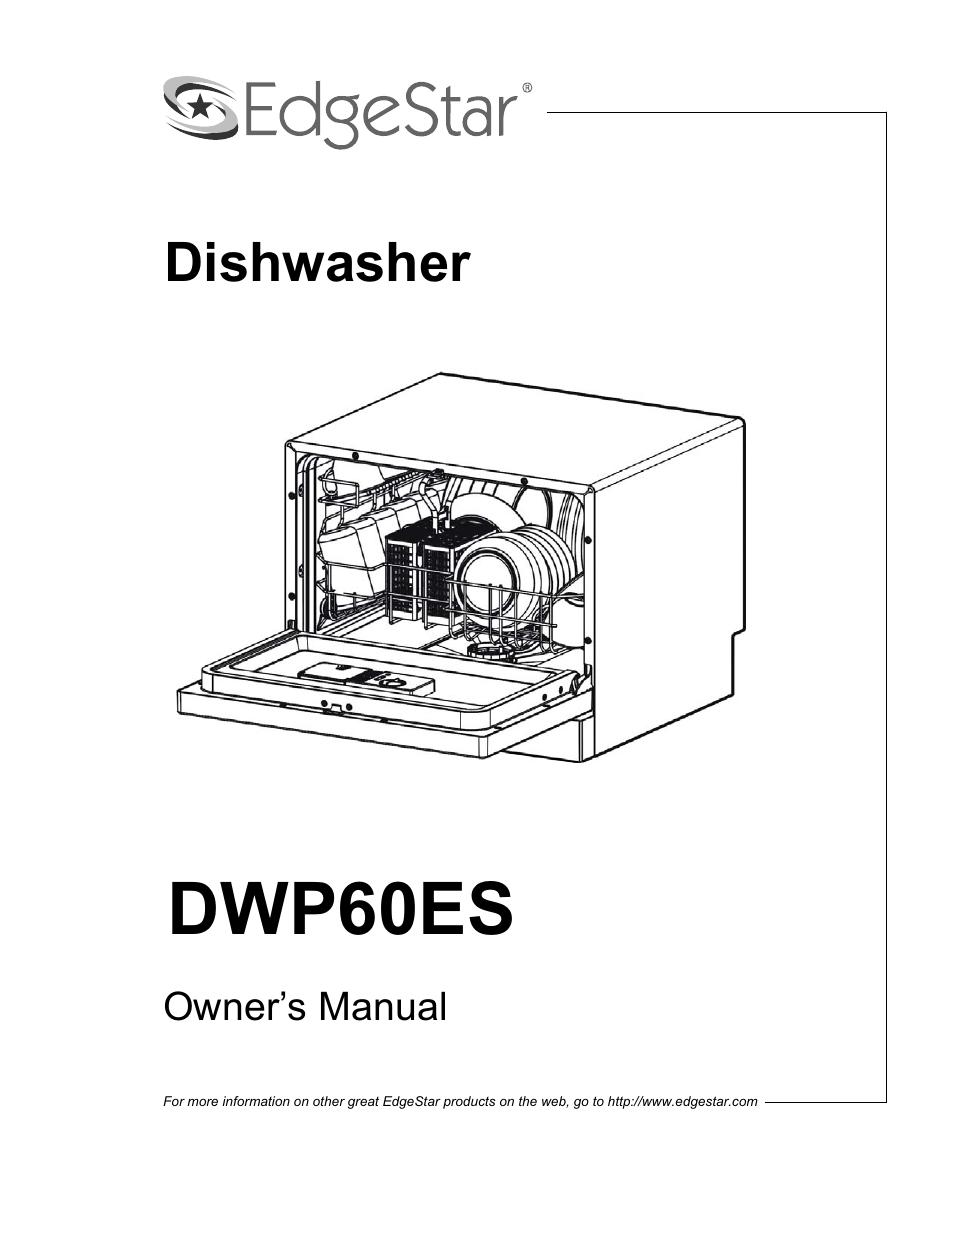 edgestar dwp60es user manual 24 pages rh manualsdir com EdgeStar Ice Maker EdgeStar Ice Maker